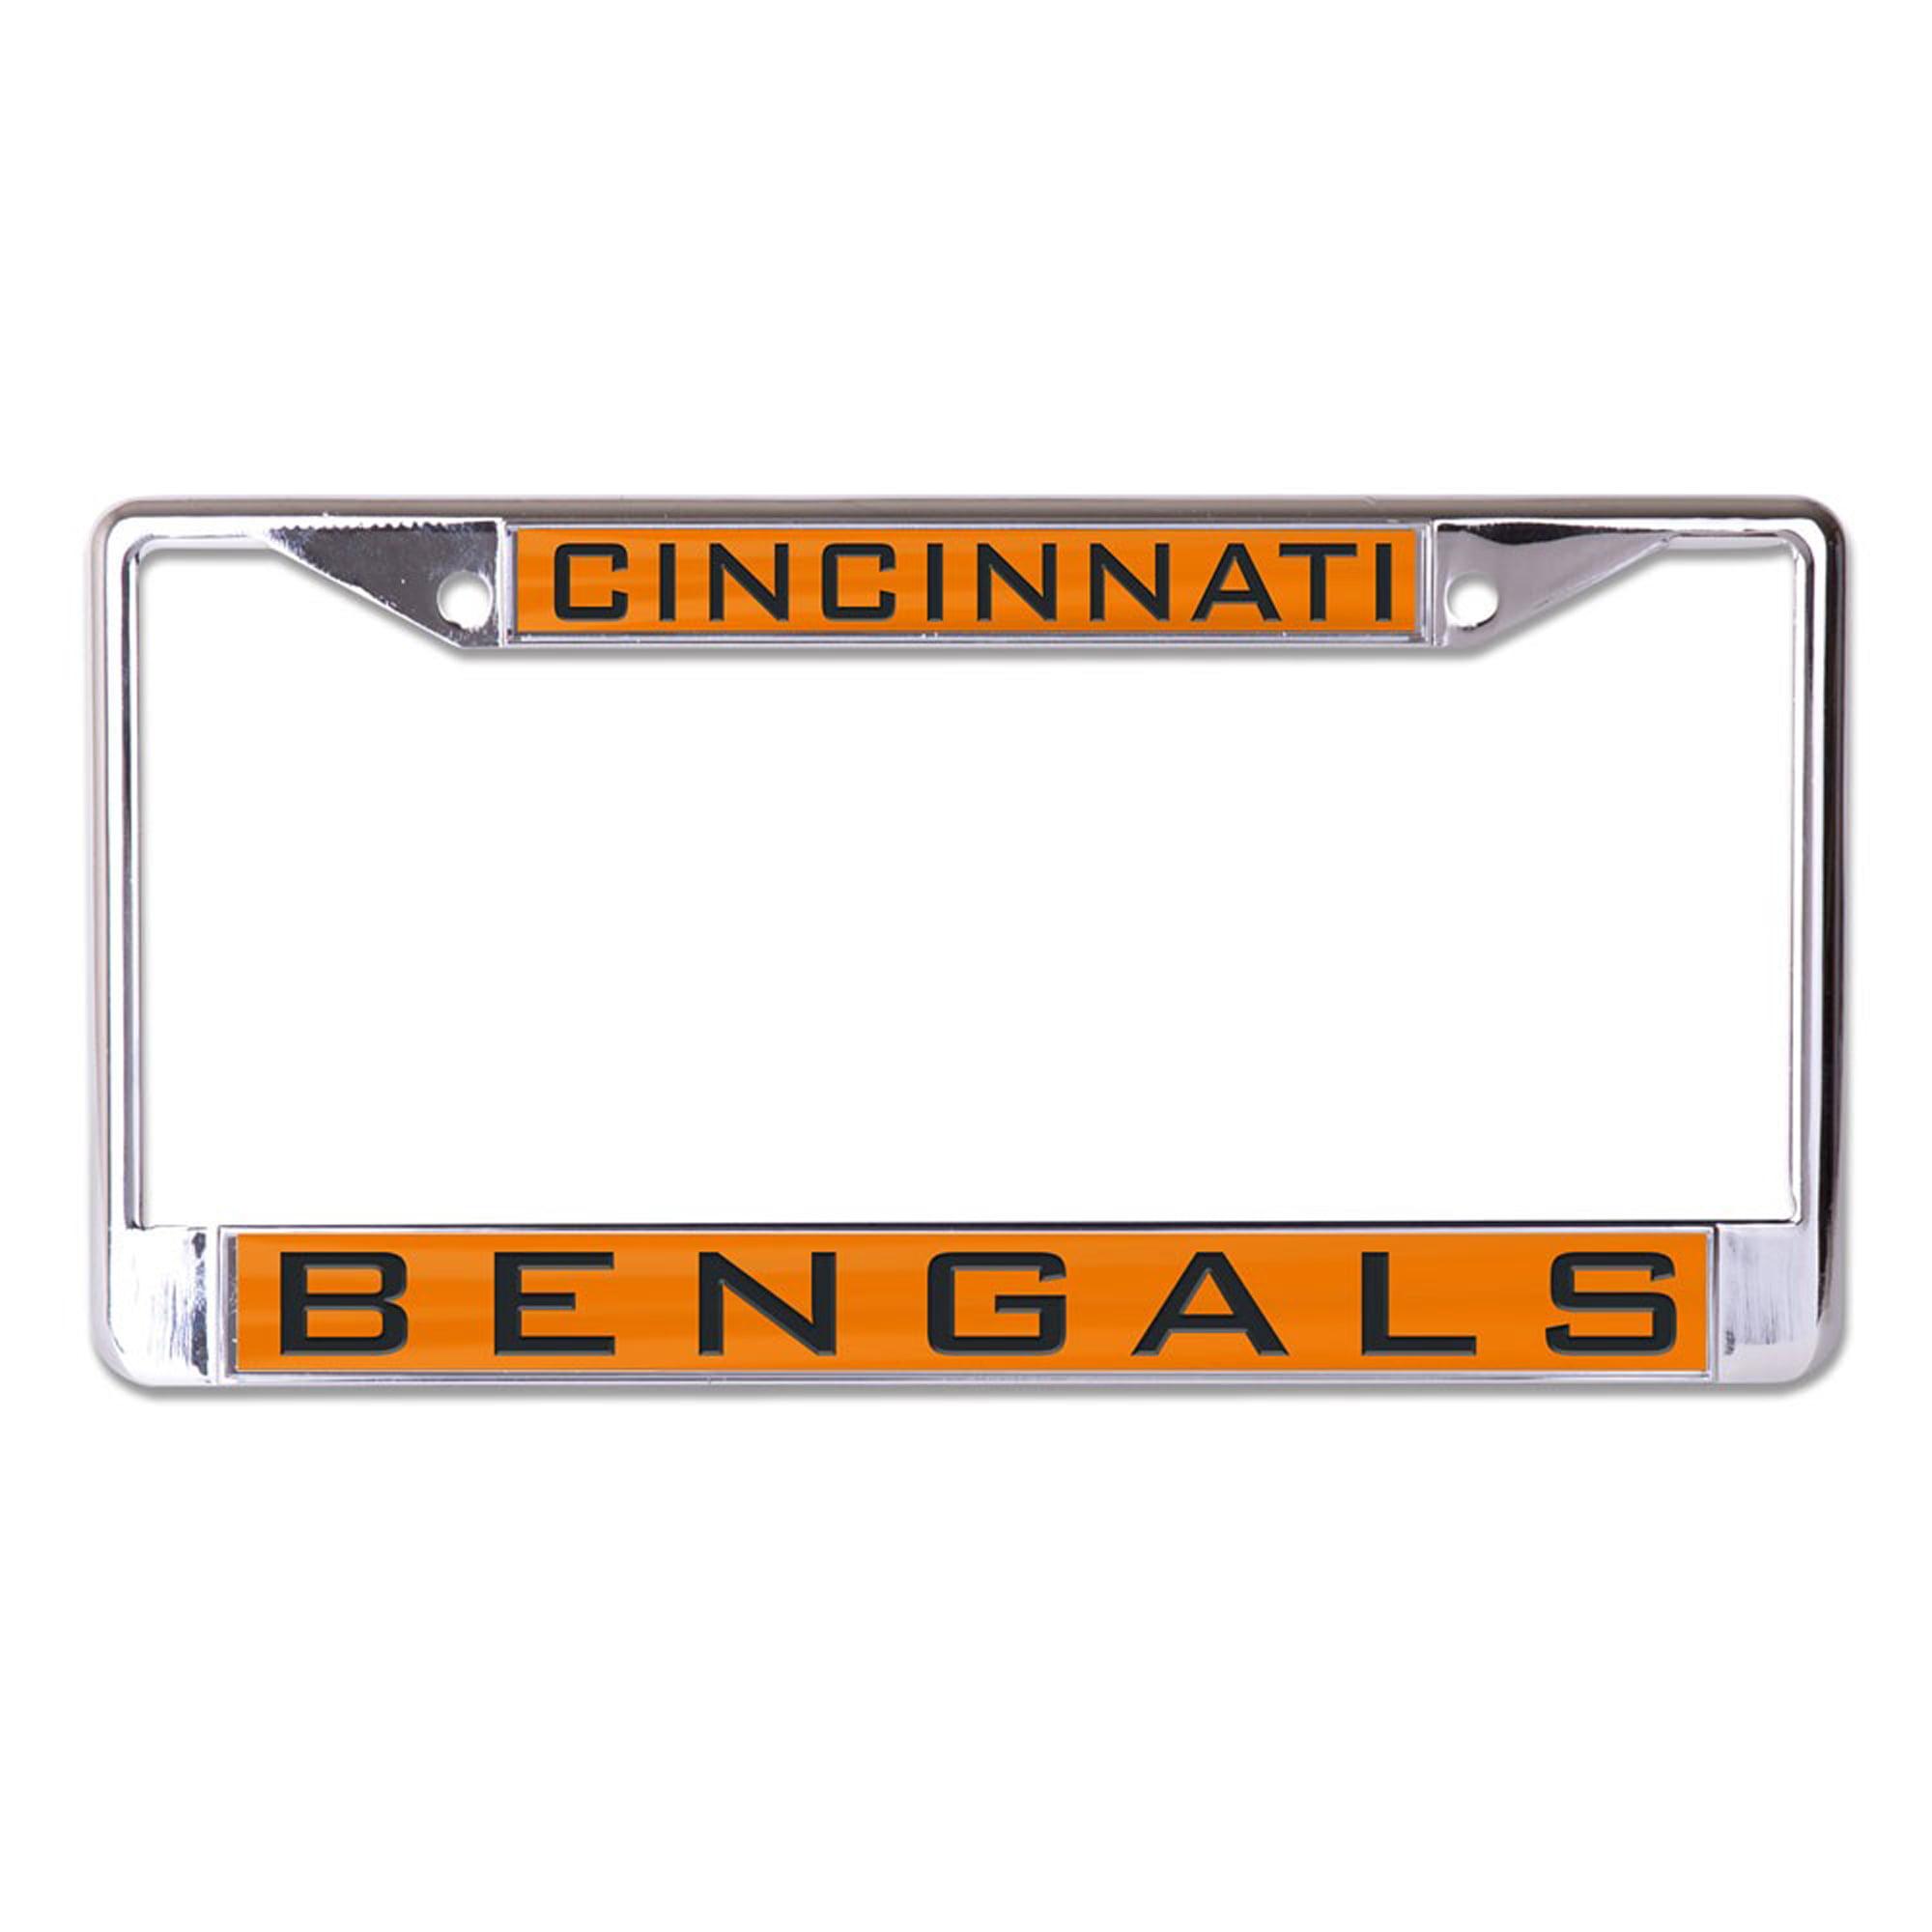 Cincinnati Bengals WinCraft Inlaid Metal License Plate Frame - No Size